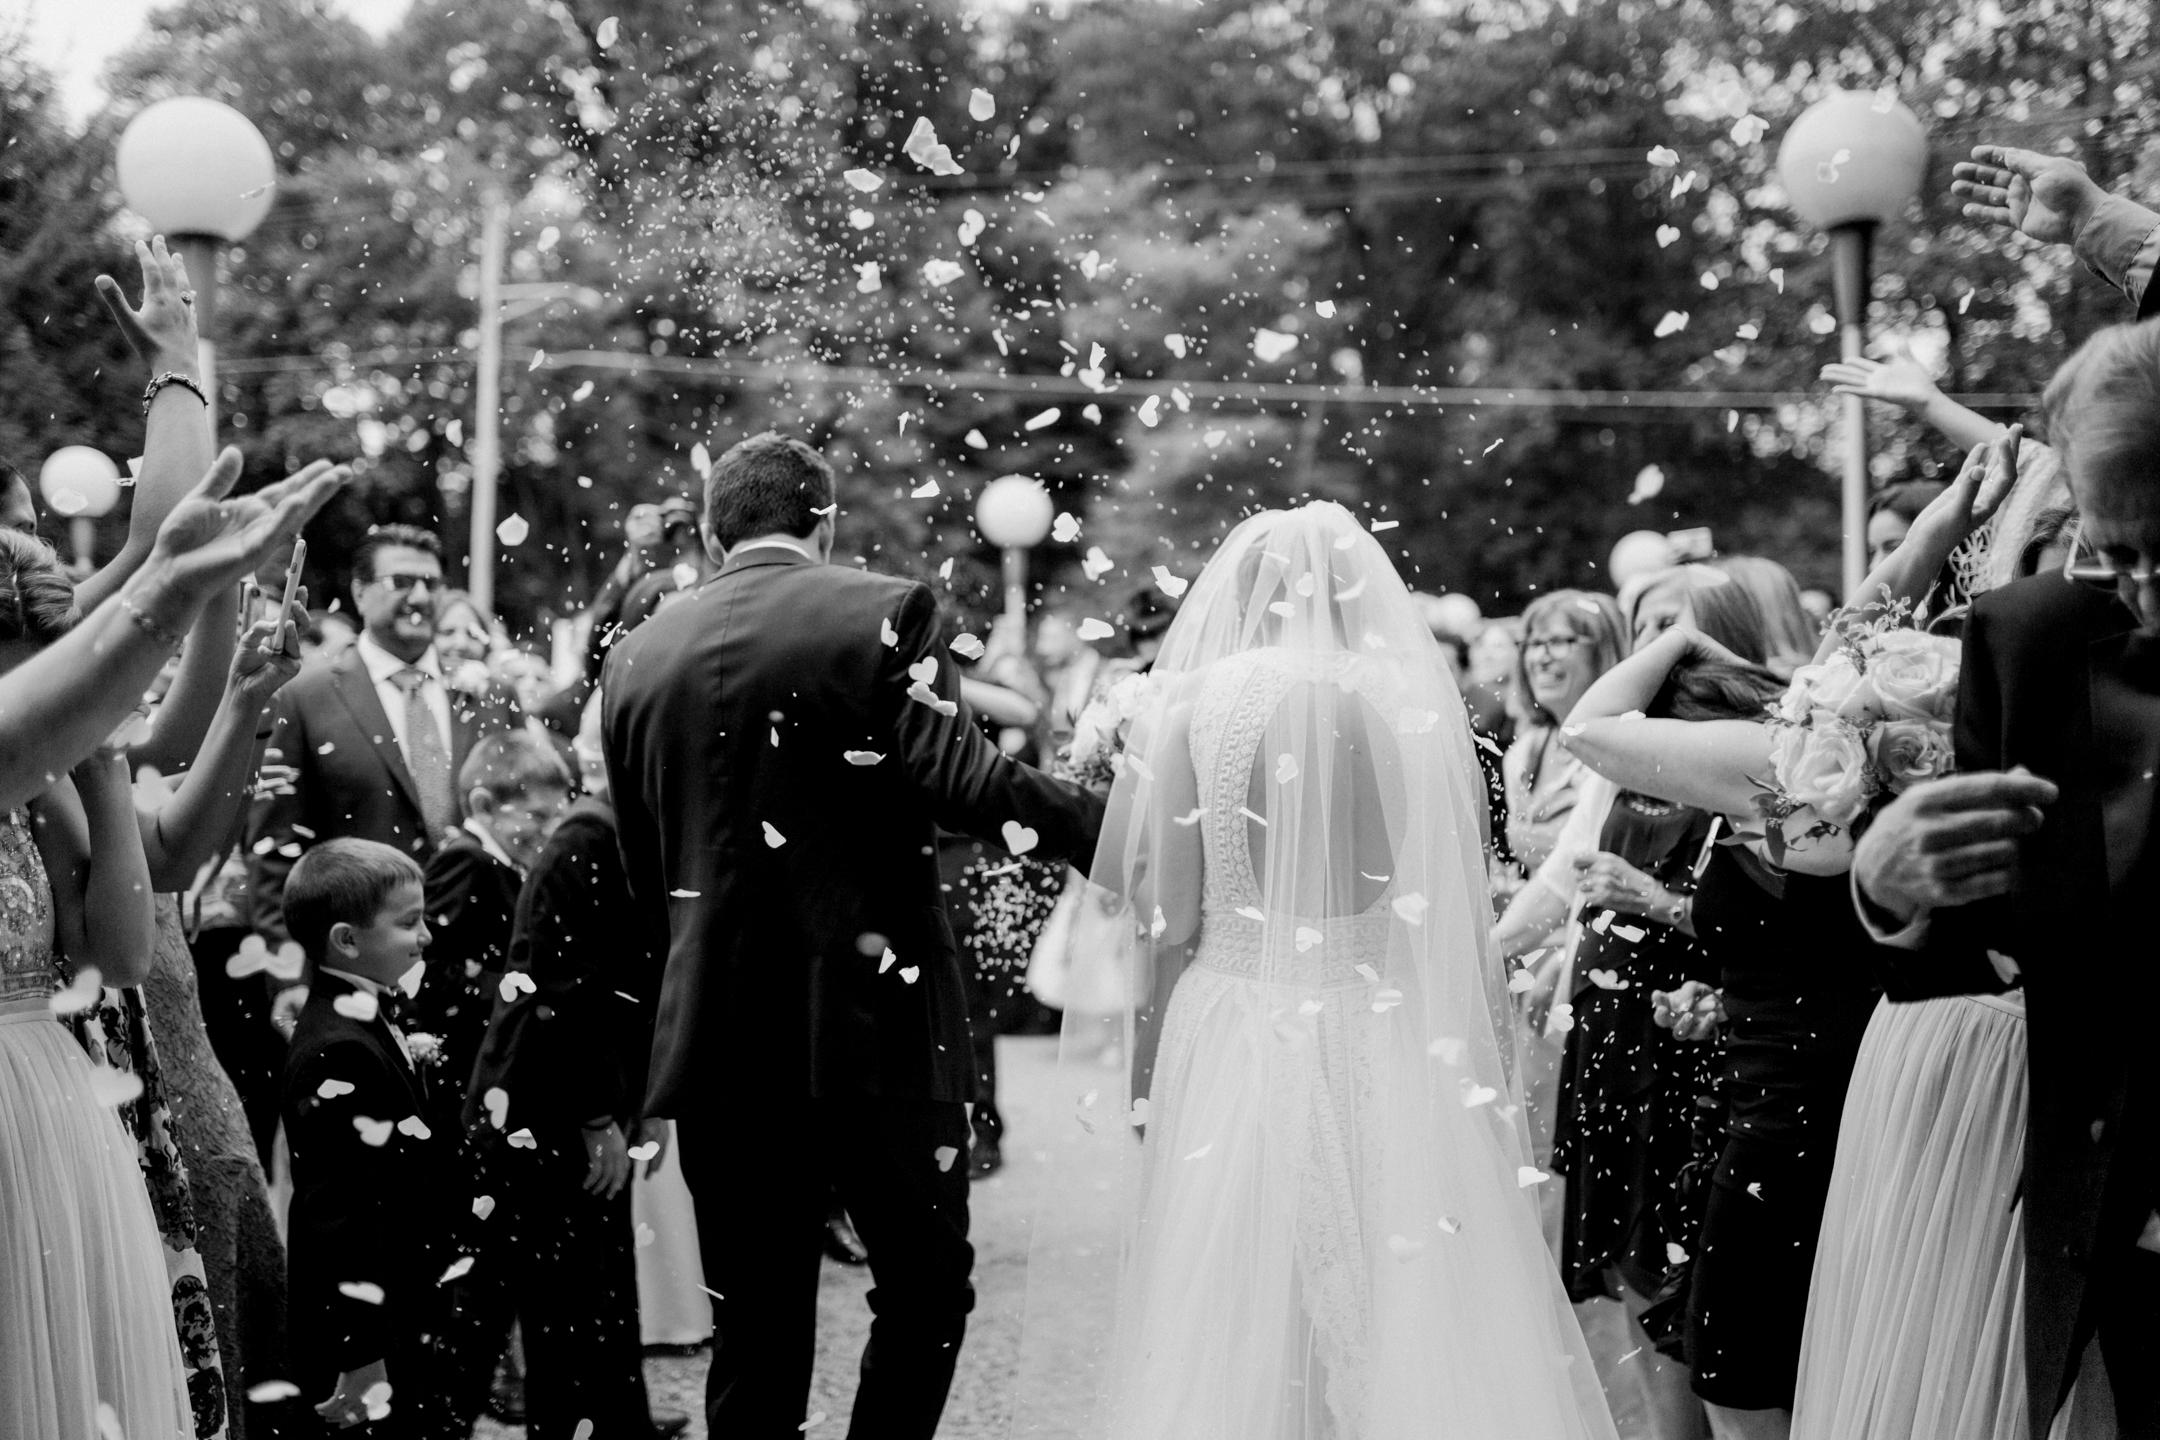 VASO + ALEX'S WEDDING TEASERS